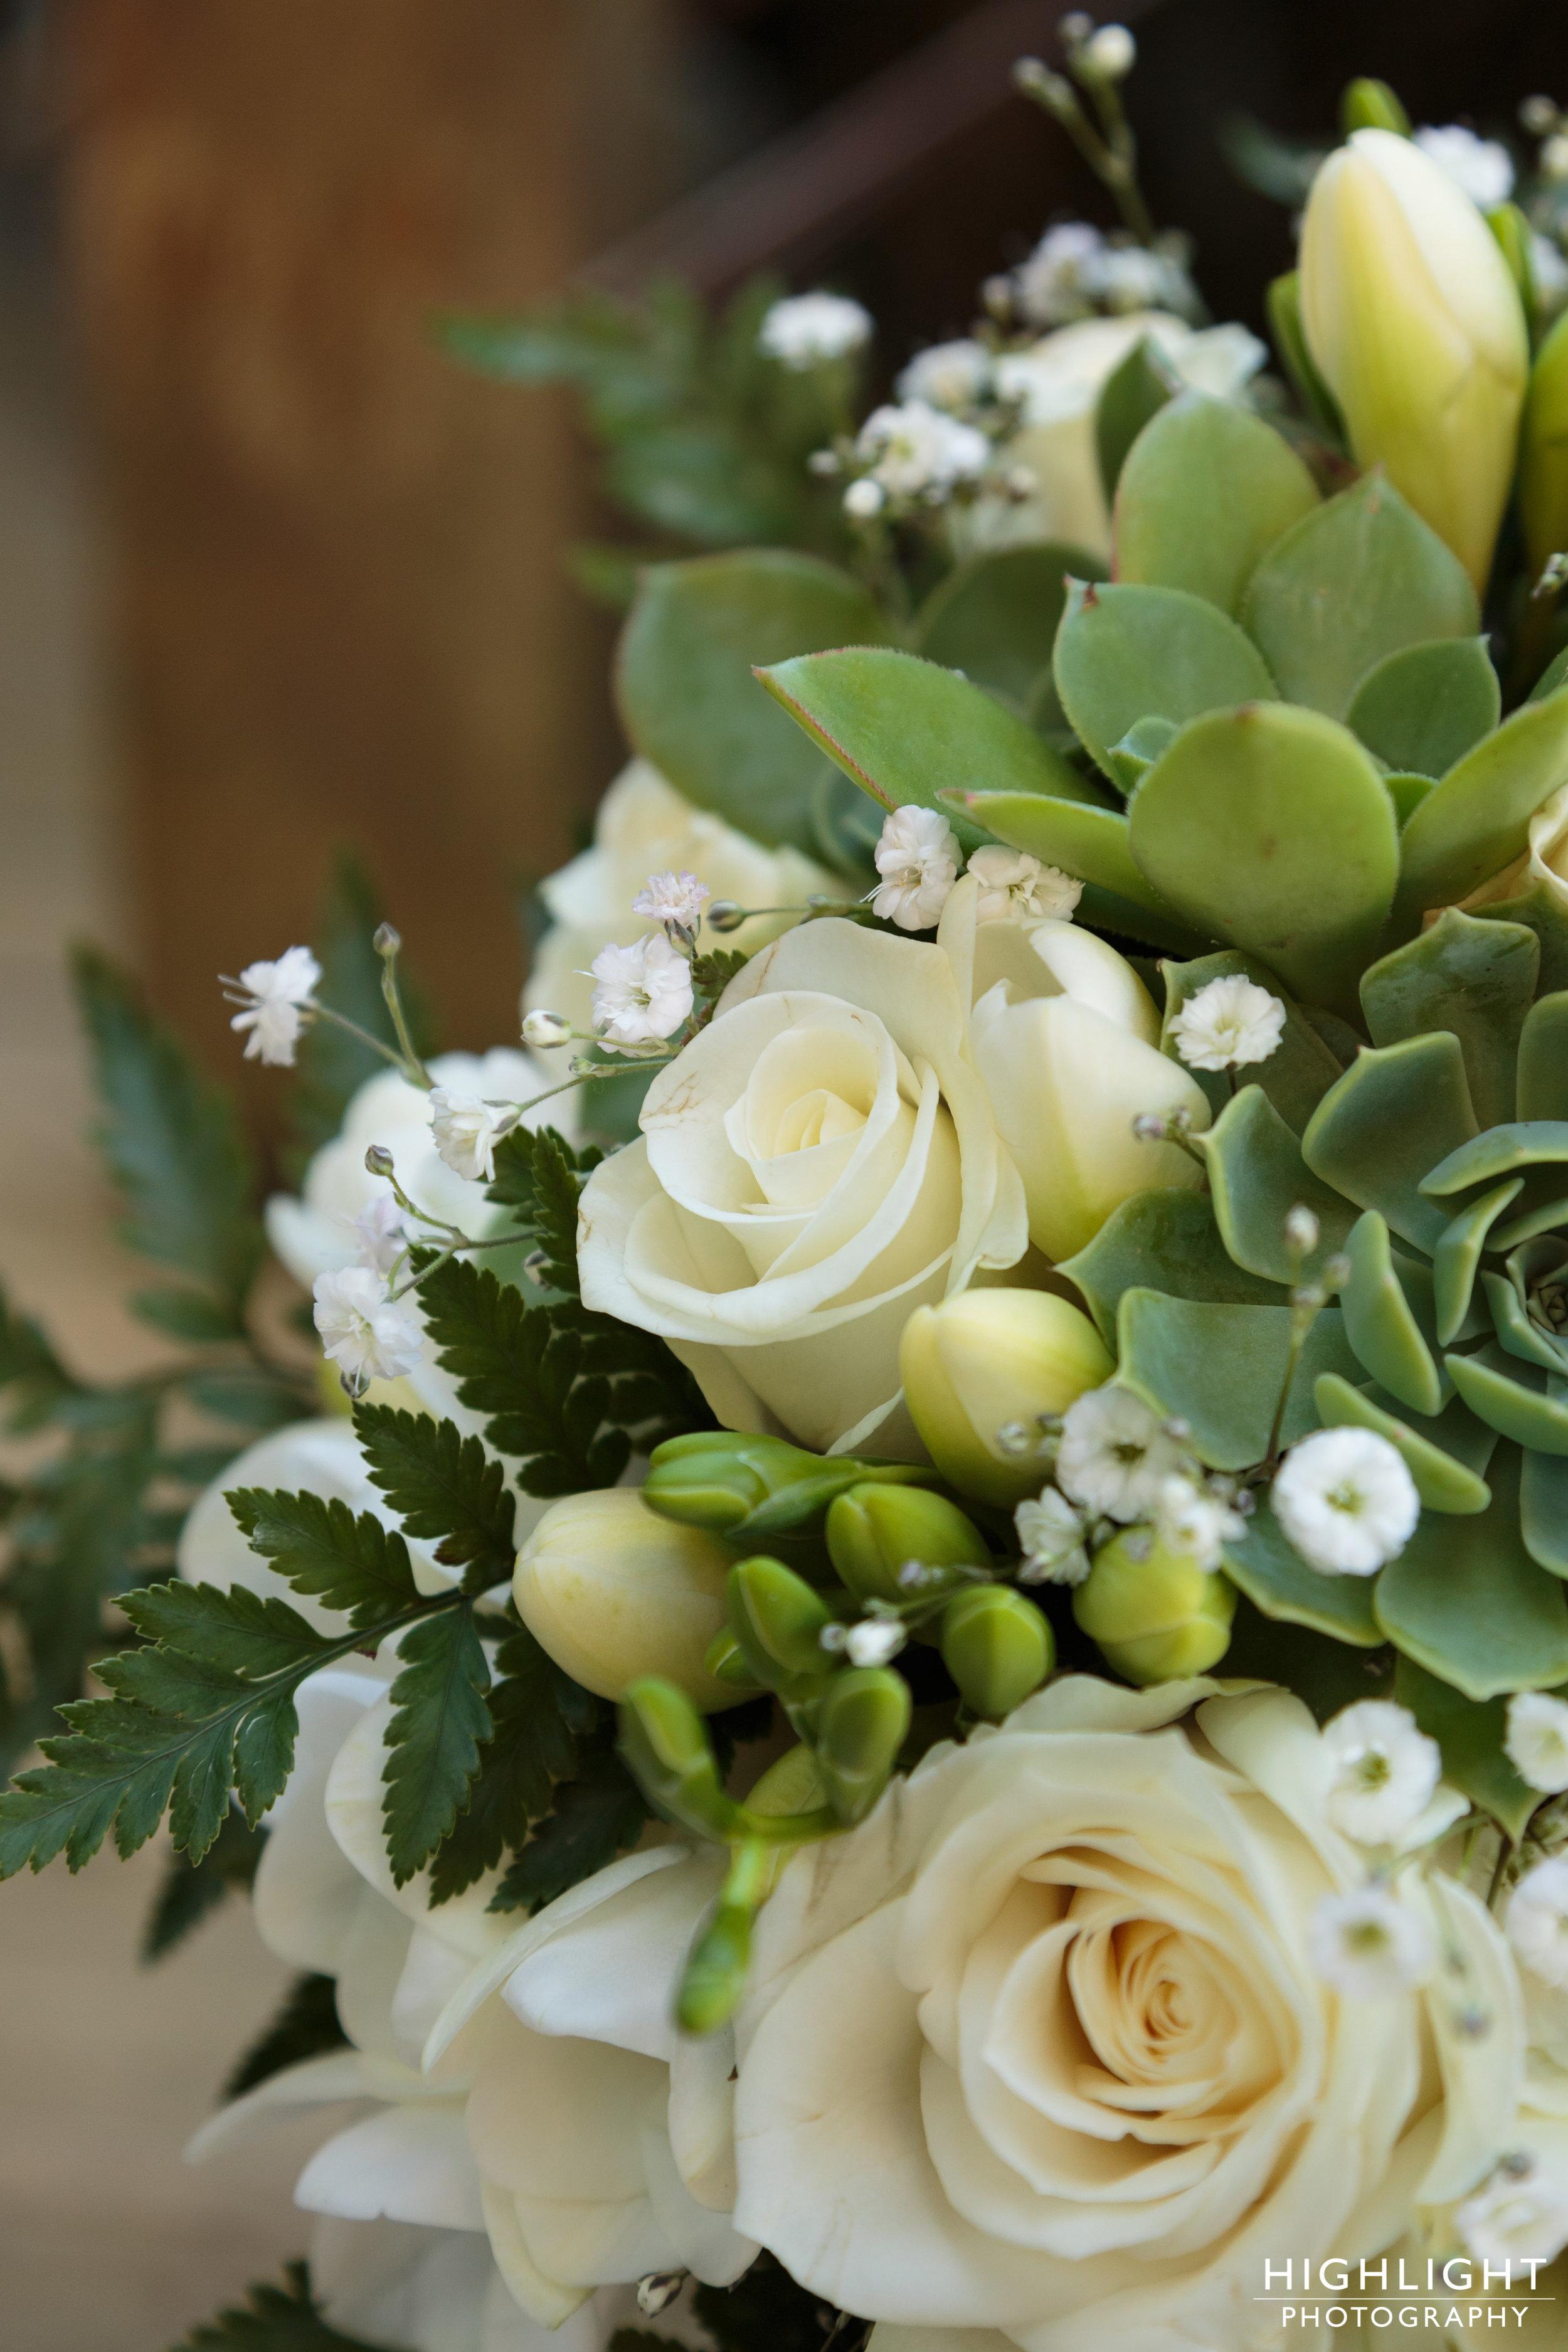 highlight_wedding_photography_makoura_lodge_manawatu_new_zealand-2.jpg